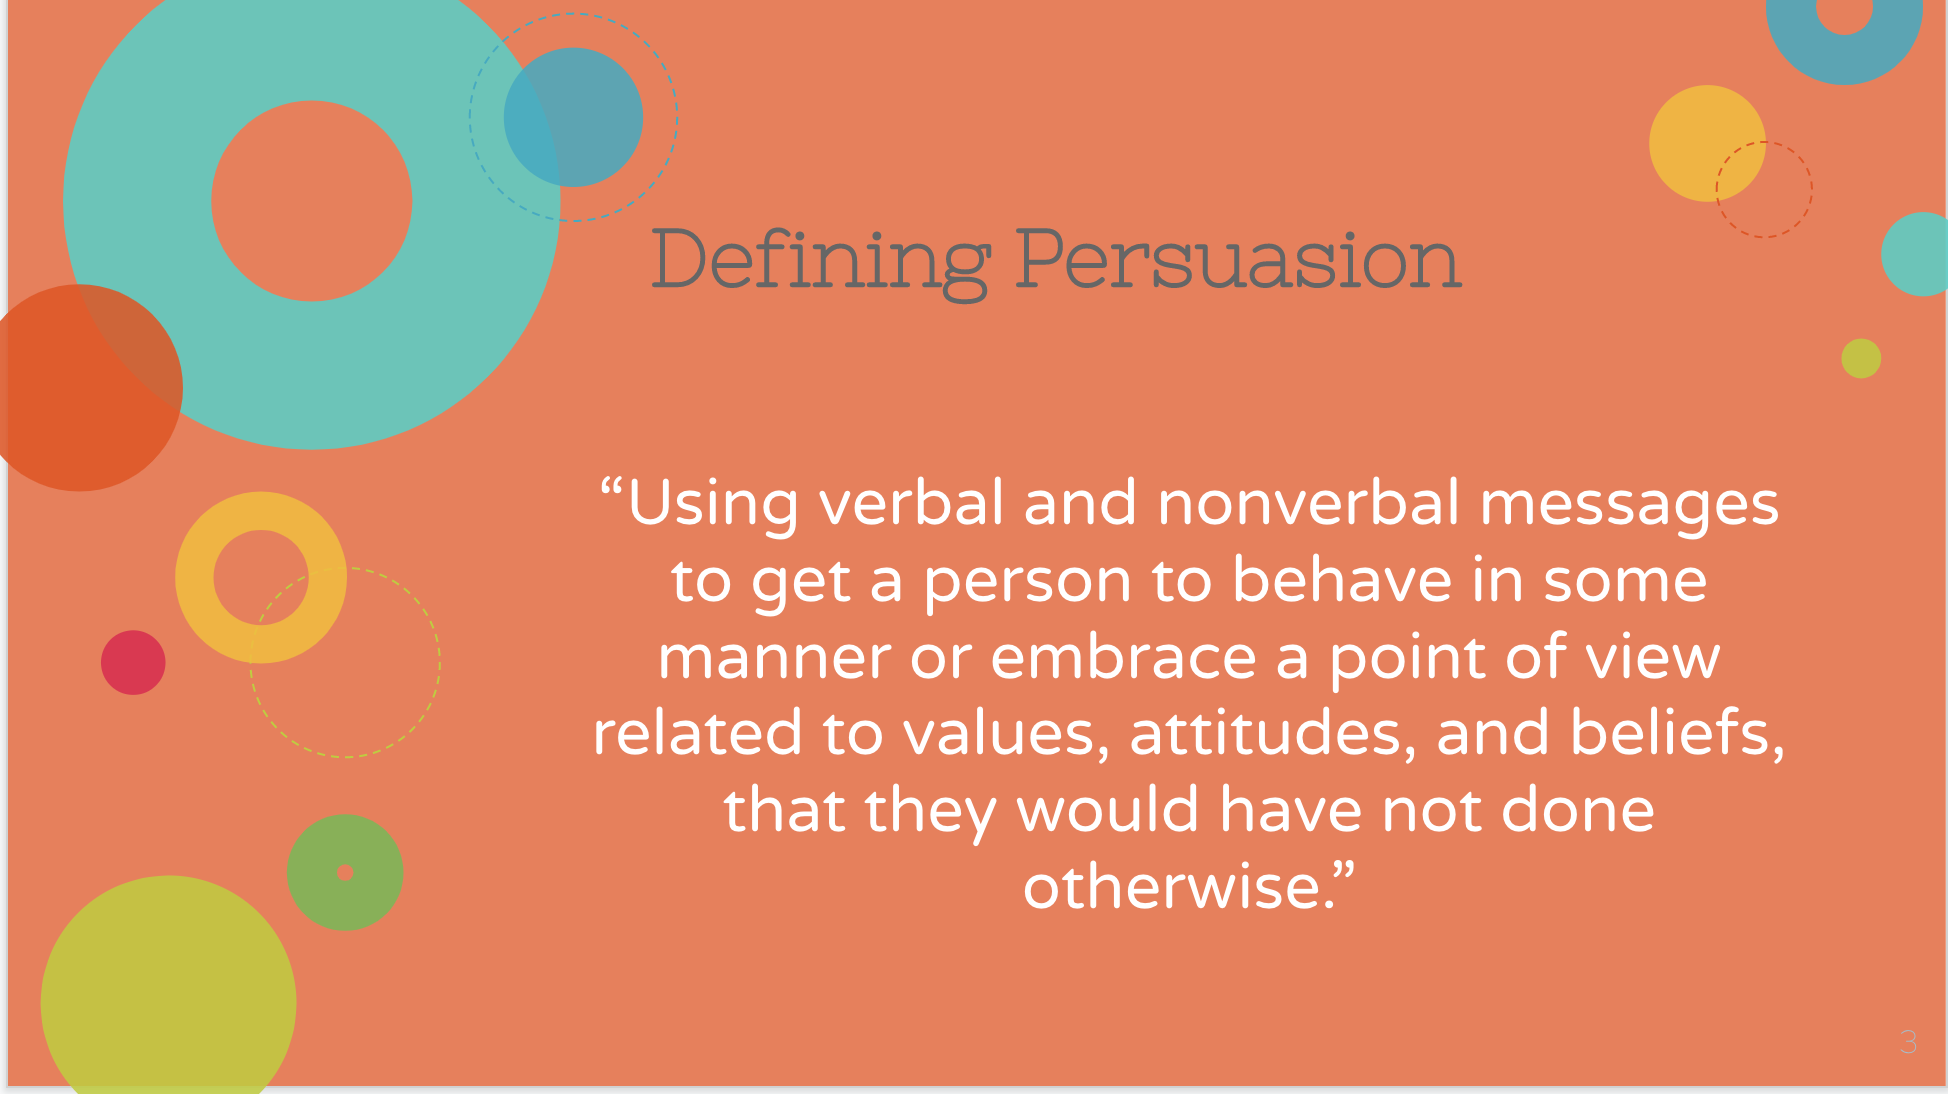 Sample Slide from Persuasive Speeches PowerPoint